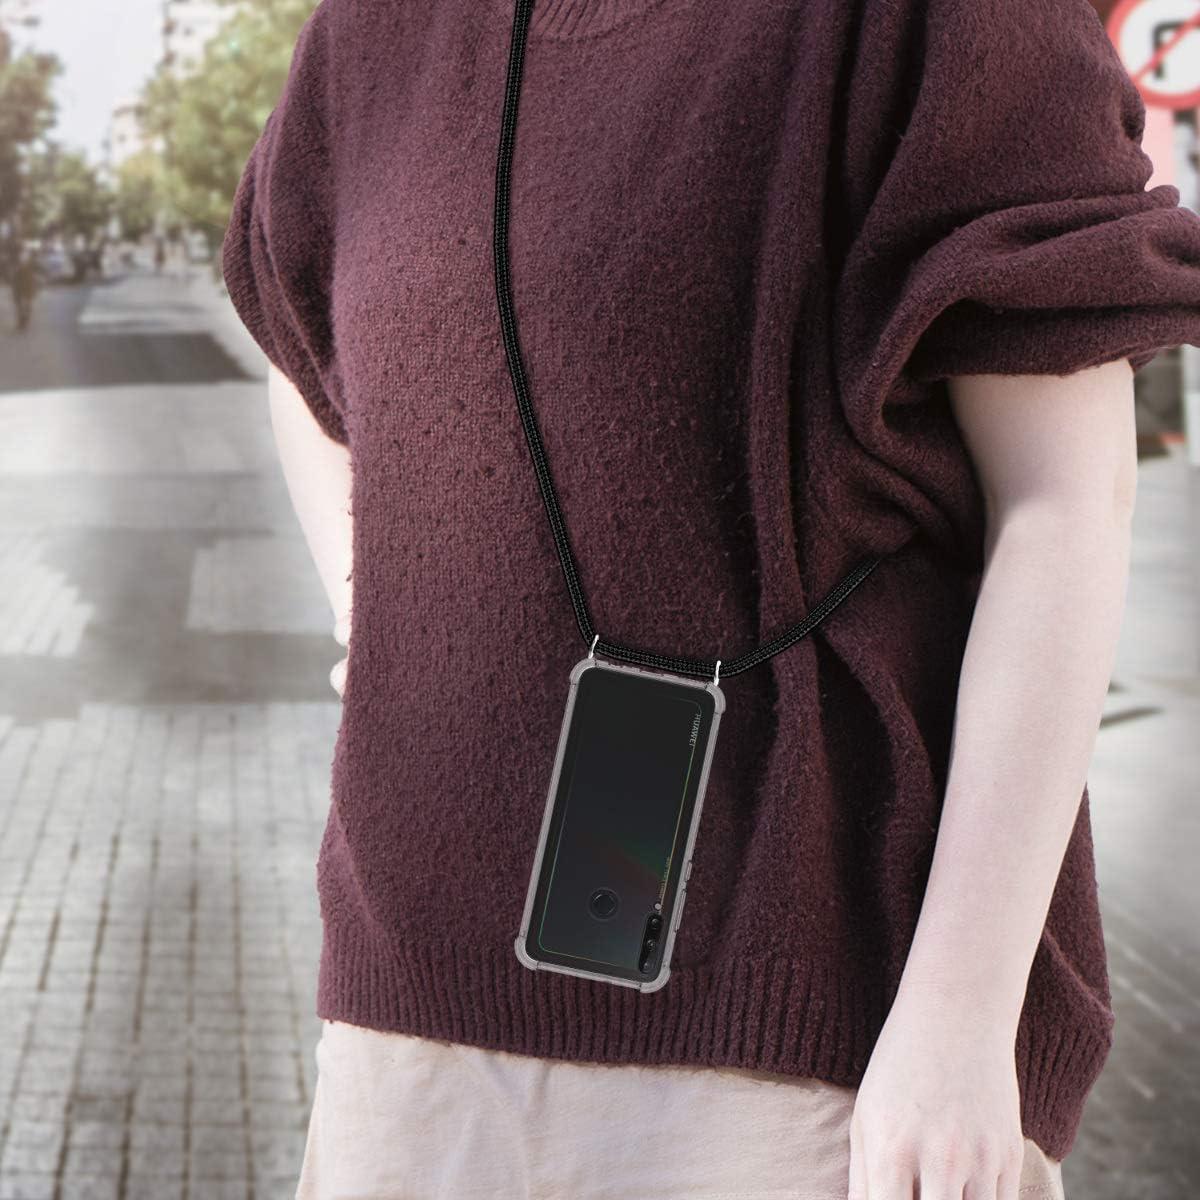 Moda y Practico XTCASE Funda con Cuerda para Huawei P40 Lite E Silicona Transparente Anti-rasgu/ños Anti-Choque Ultrafina Suave TPU Carcasa de movil con Colgante - Negro